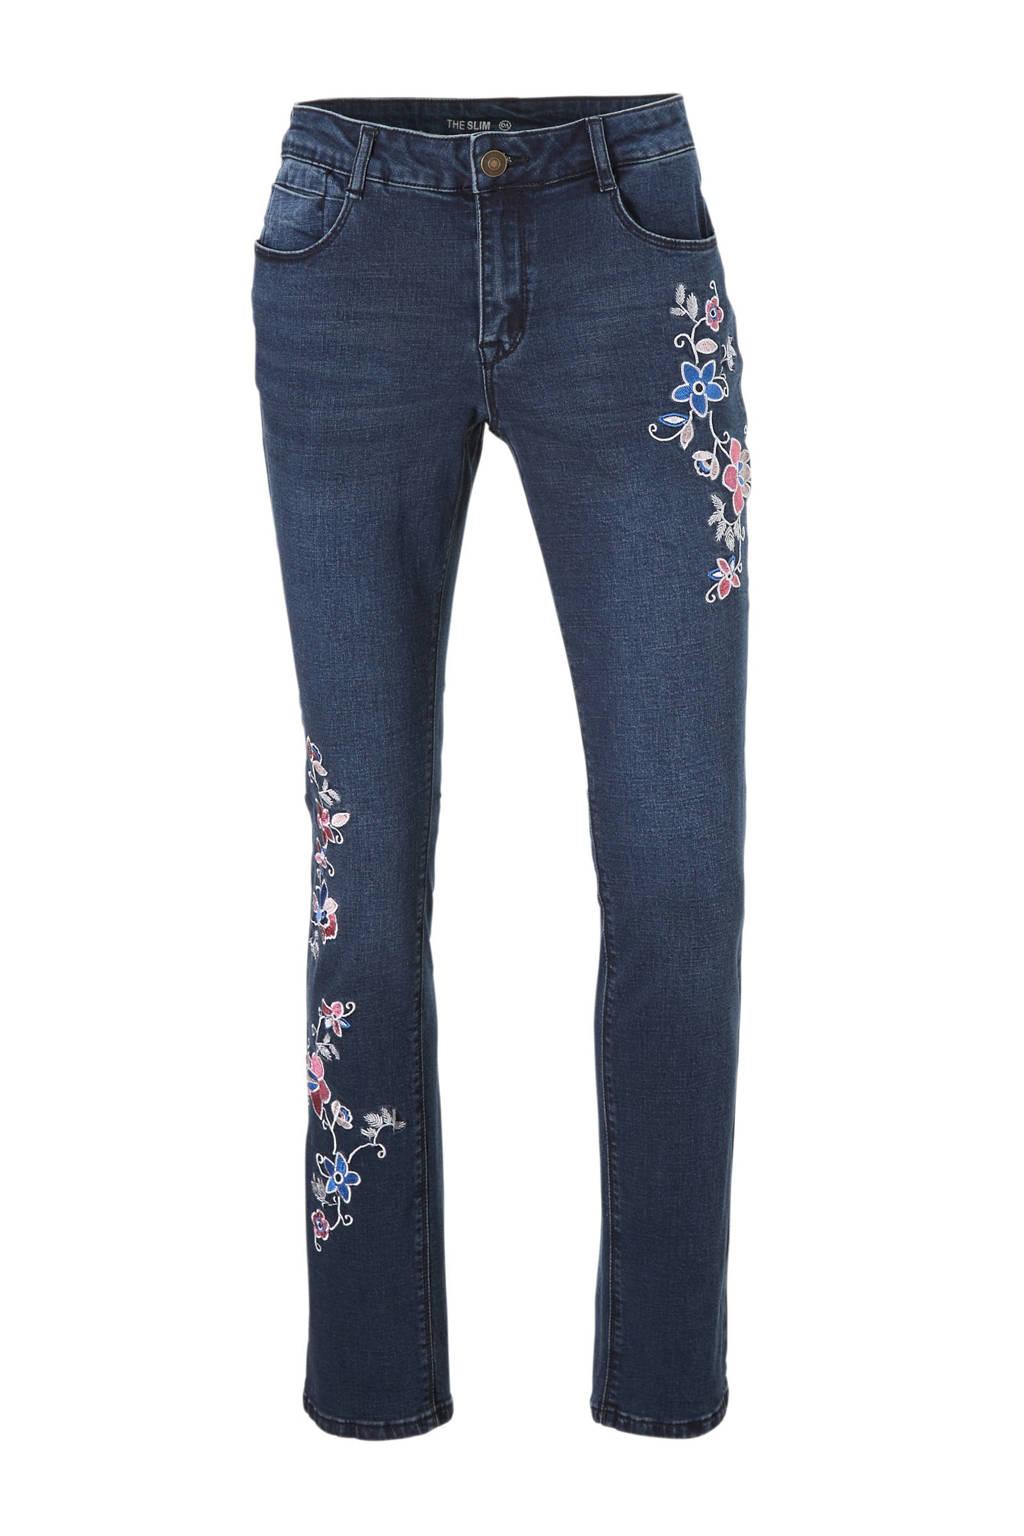 C&A The Denim slim fit jeans met borduursels, Dark denim